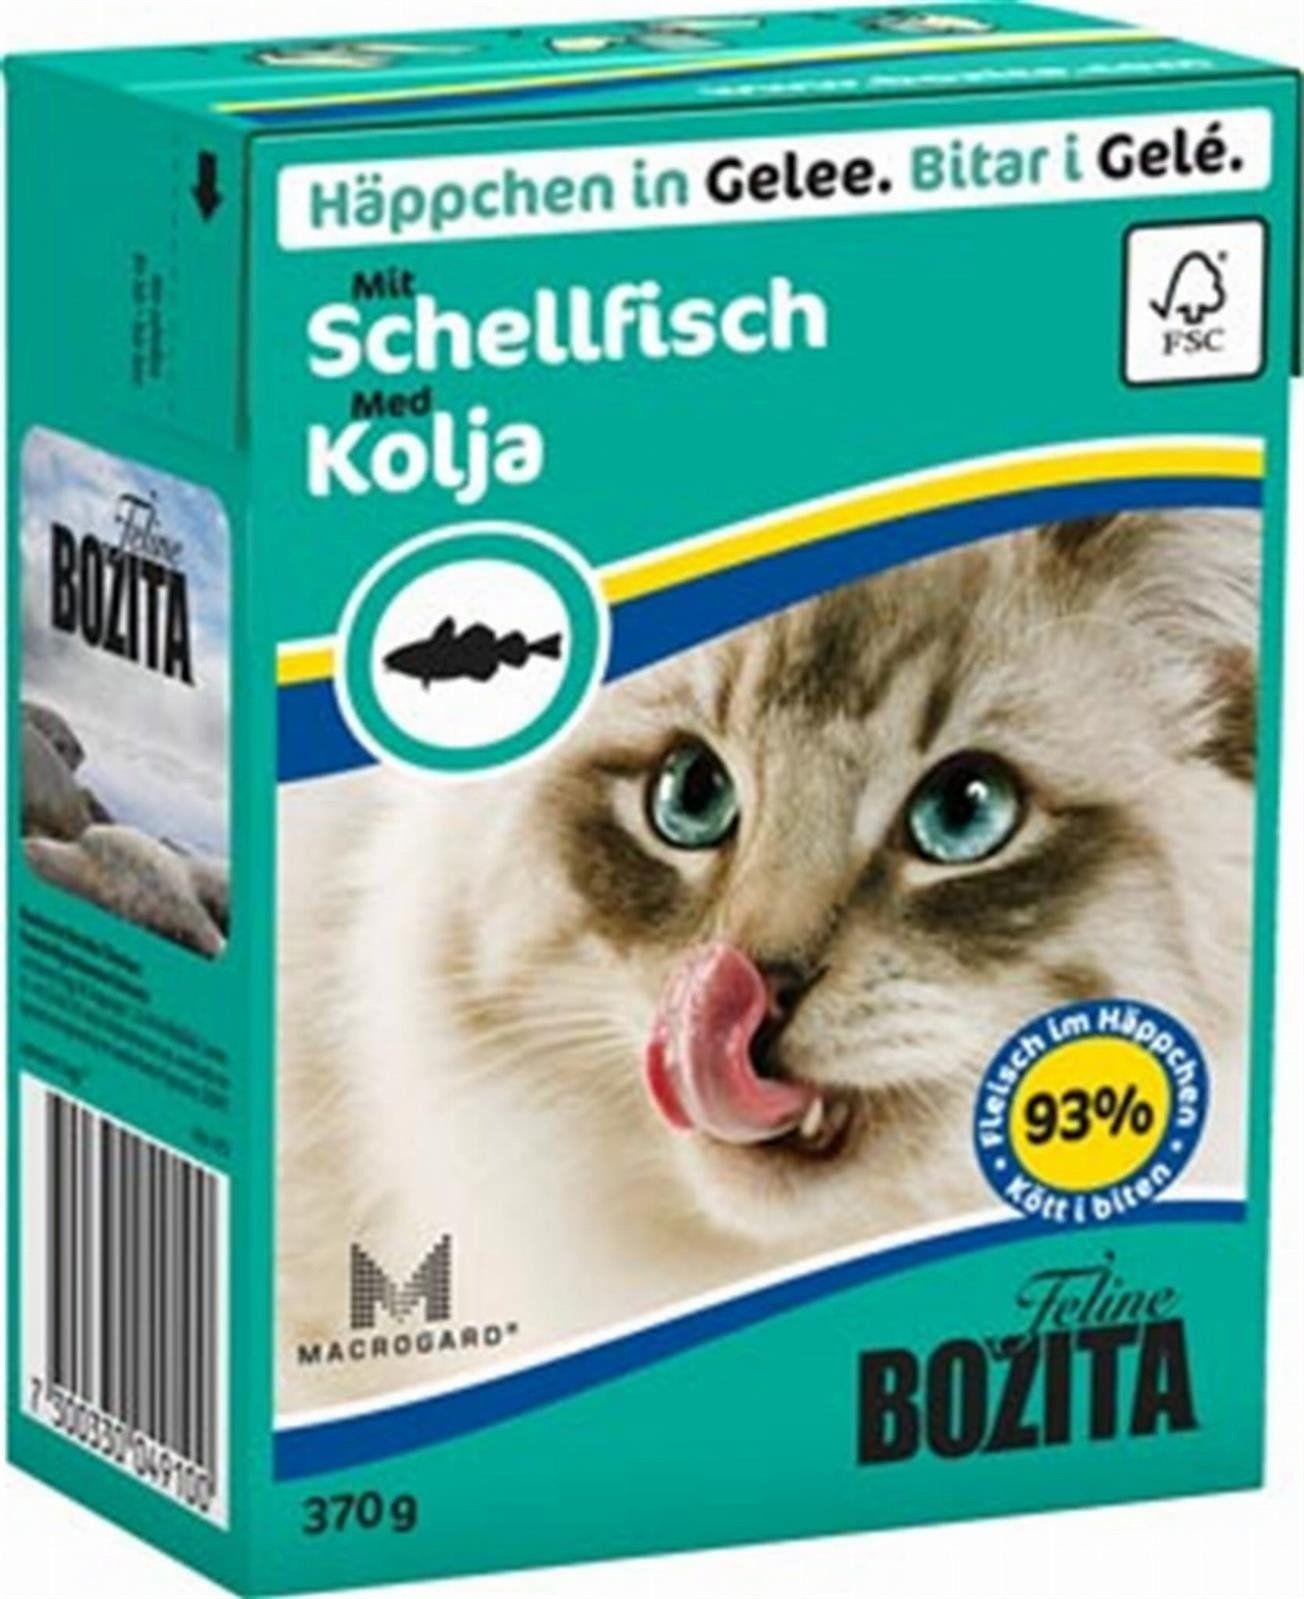 Bozita Feline 370g Dorsz w Galaretce